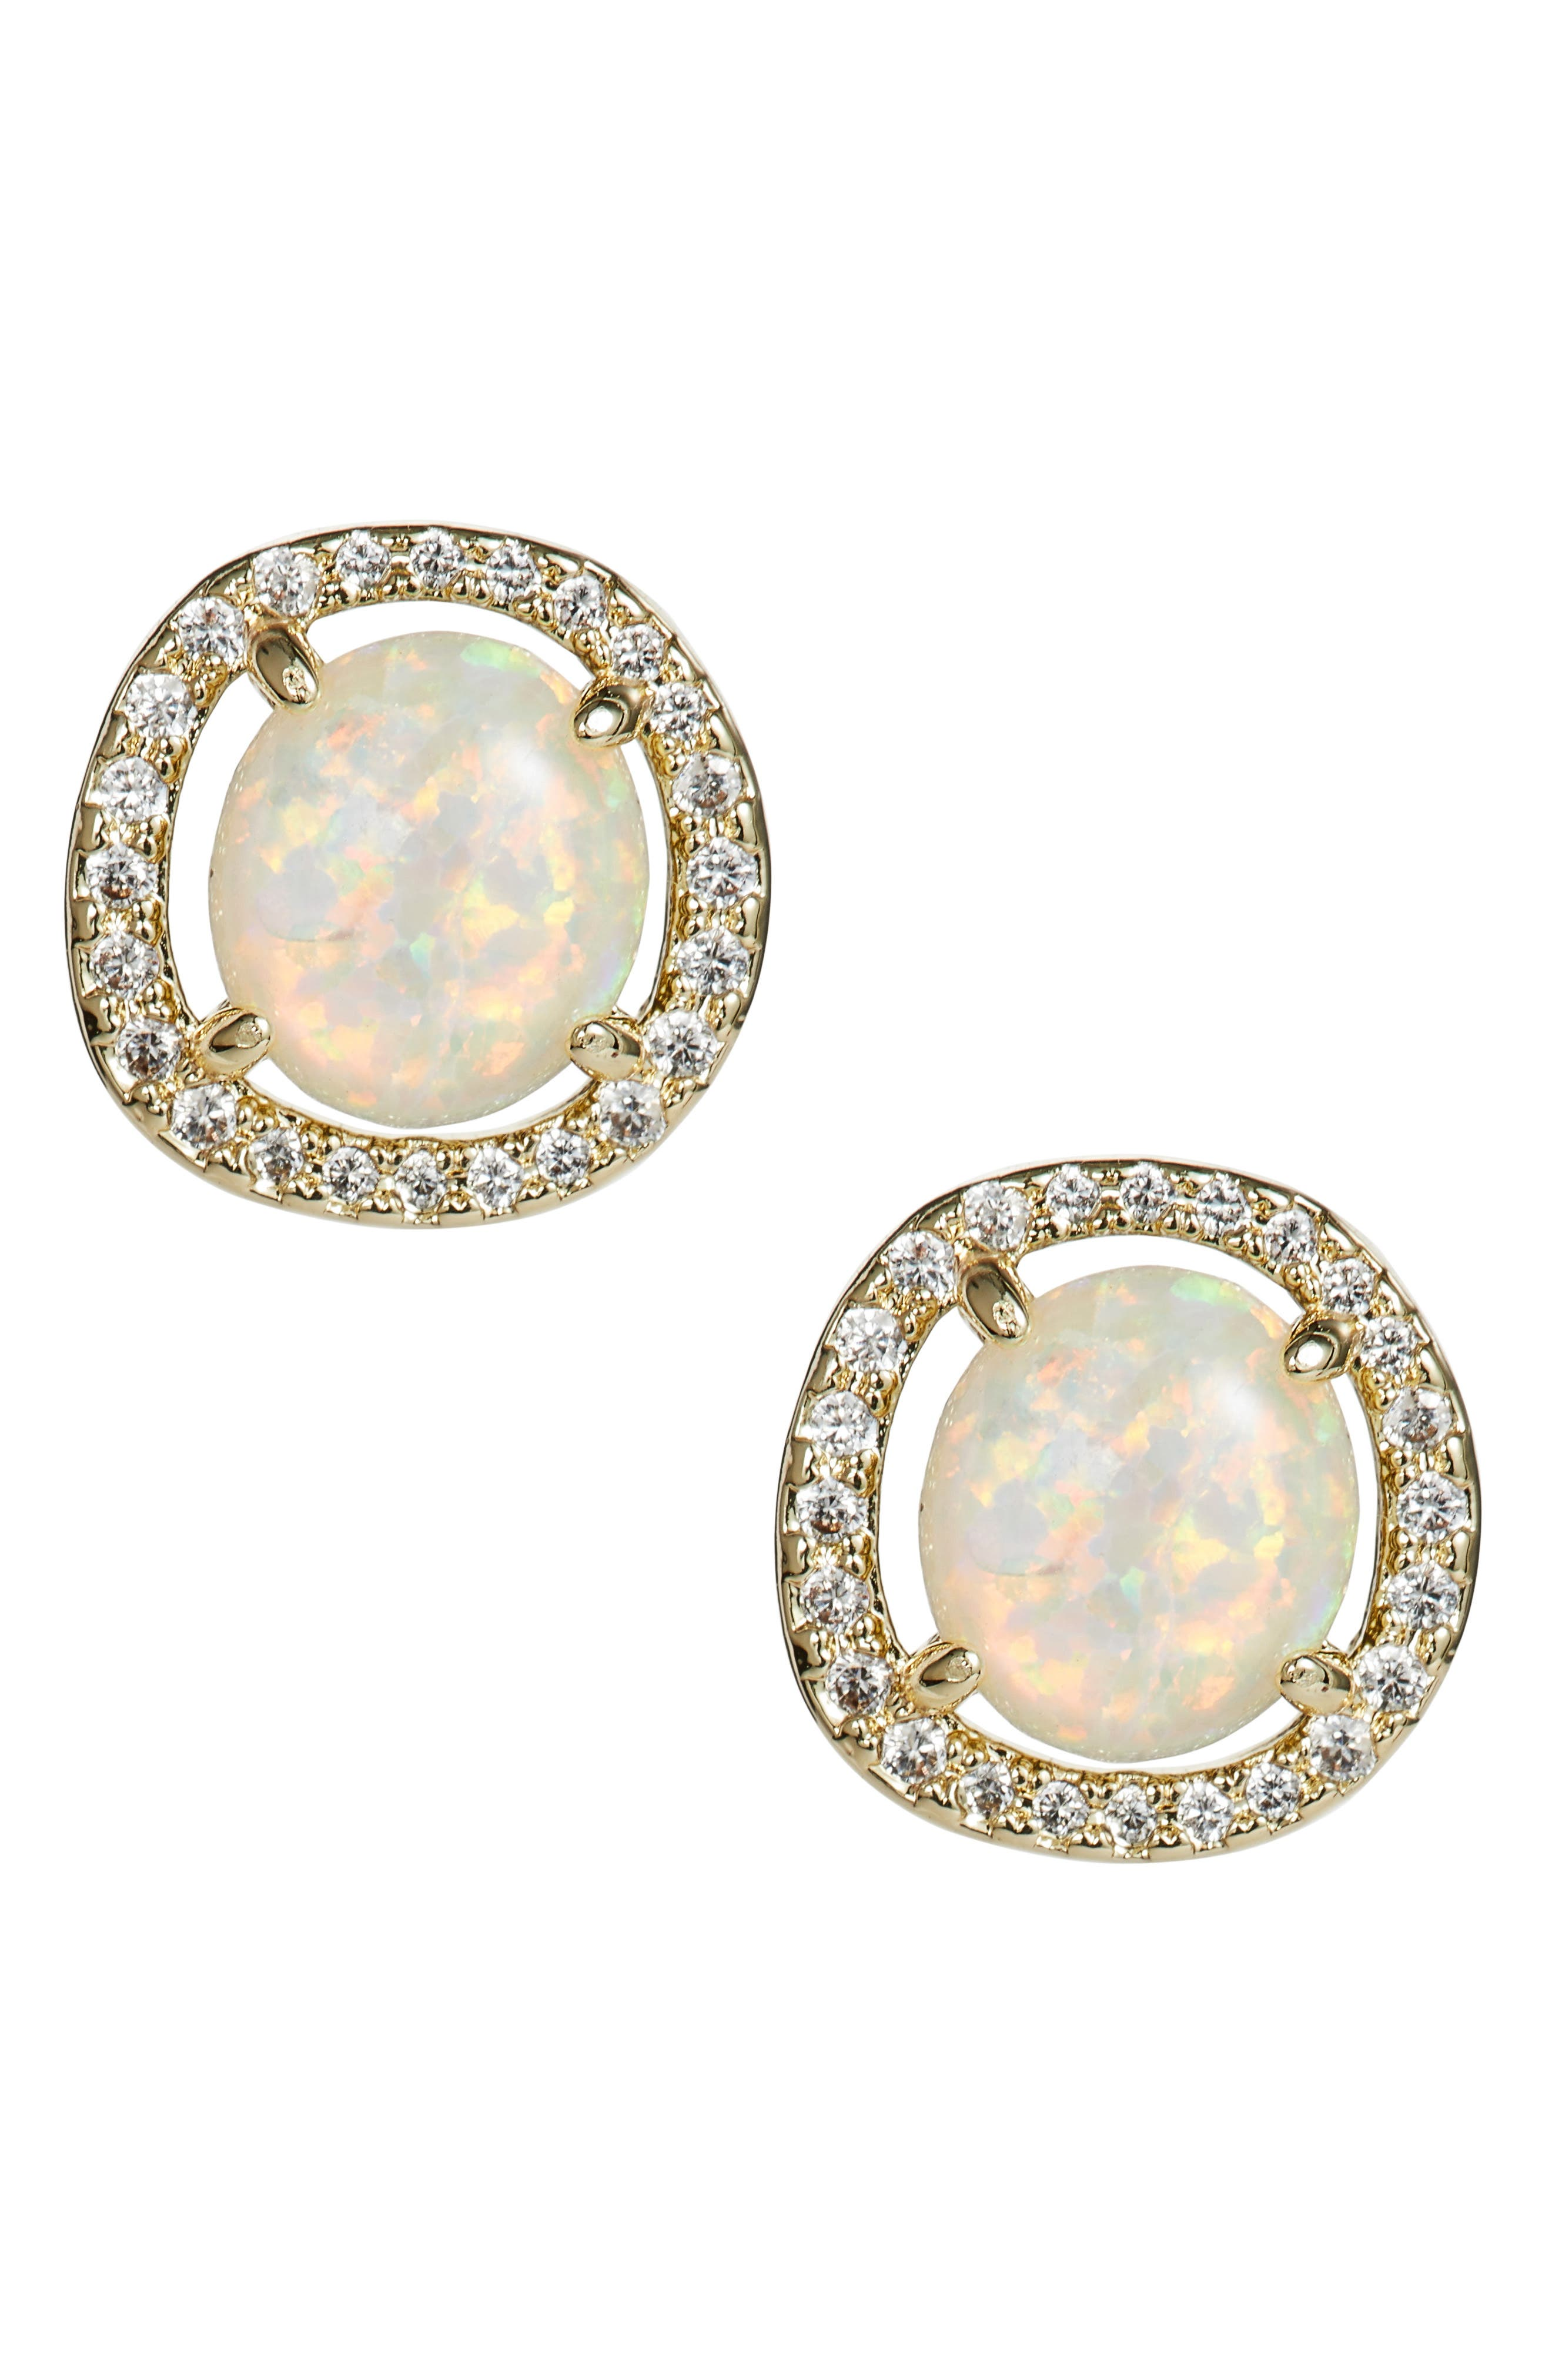 Sarah Louise Opal Stud Earrings, White Opal/ Gold